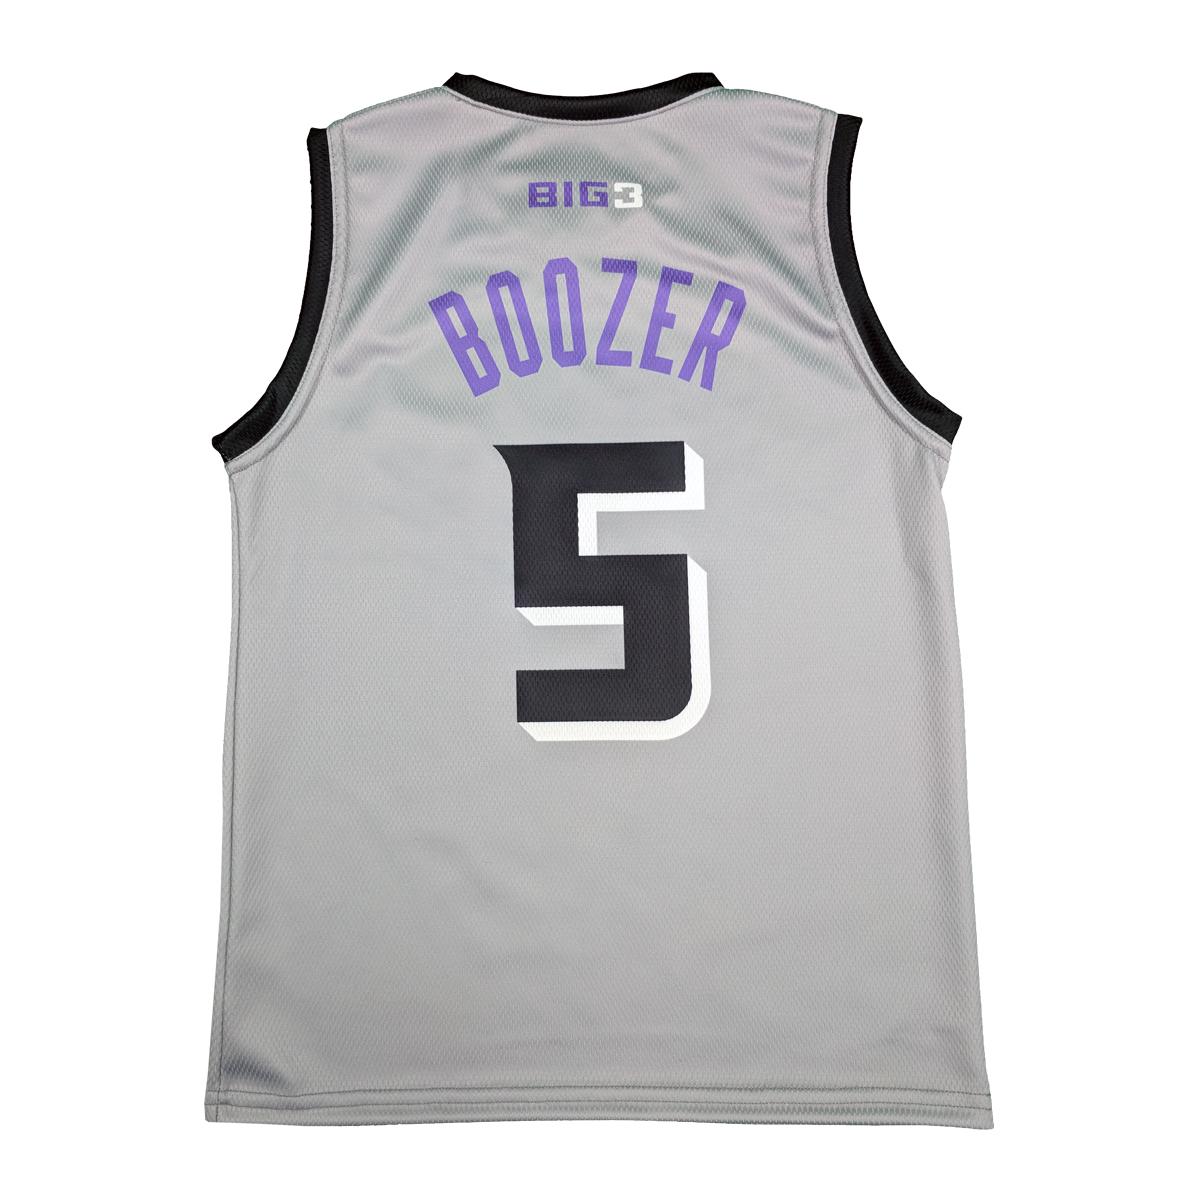 Boozer Jersey